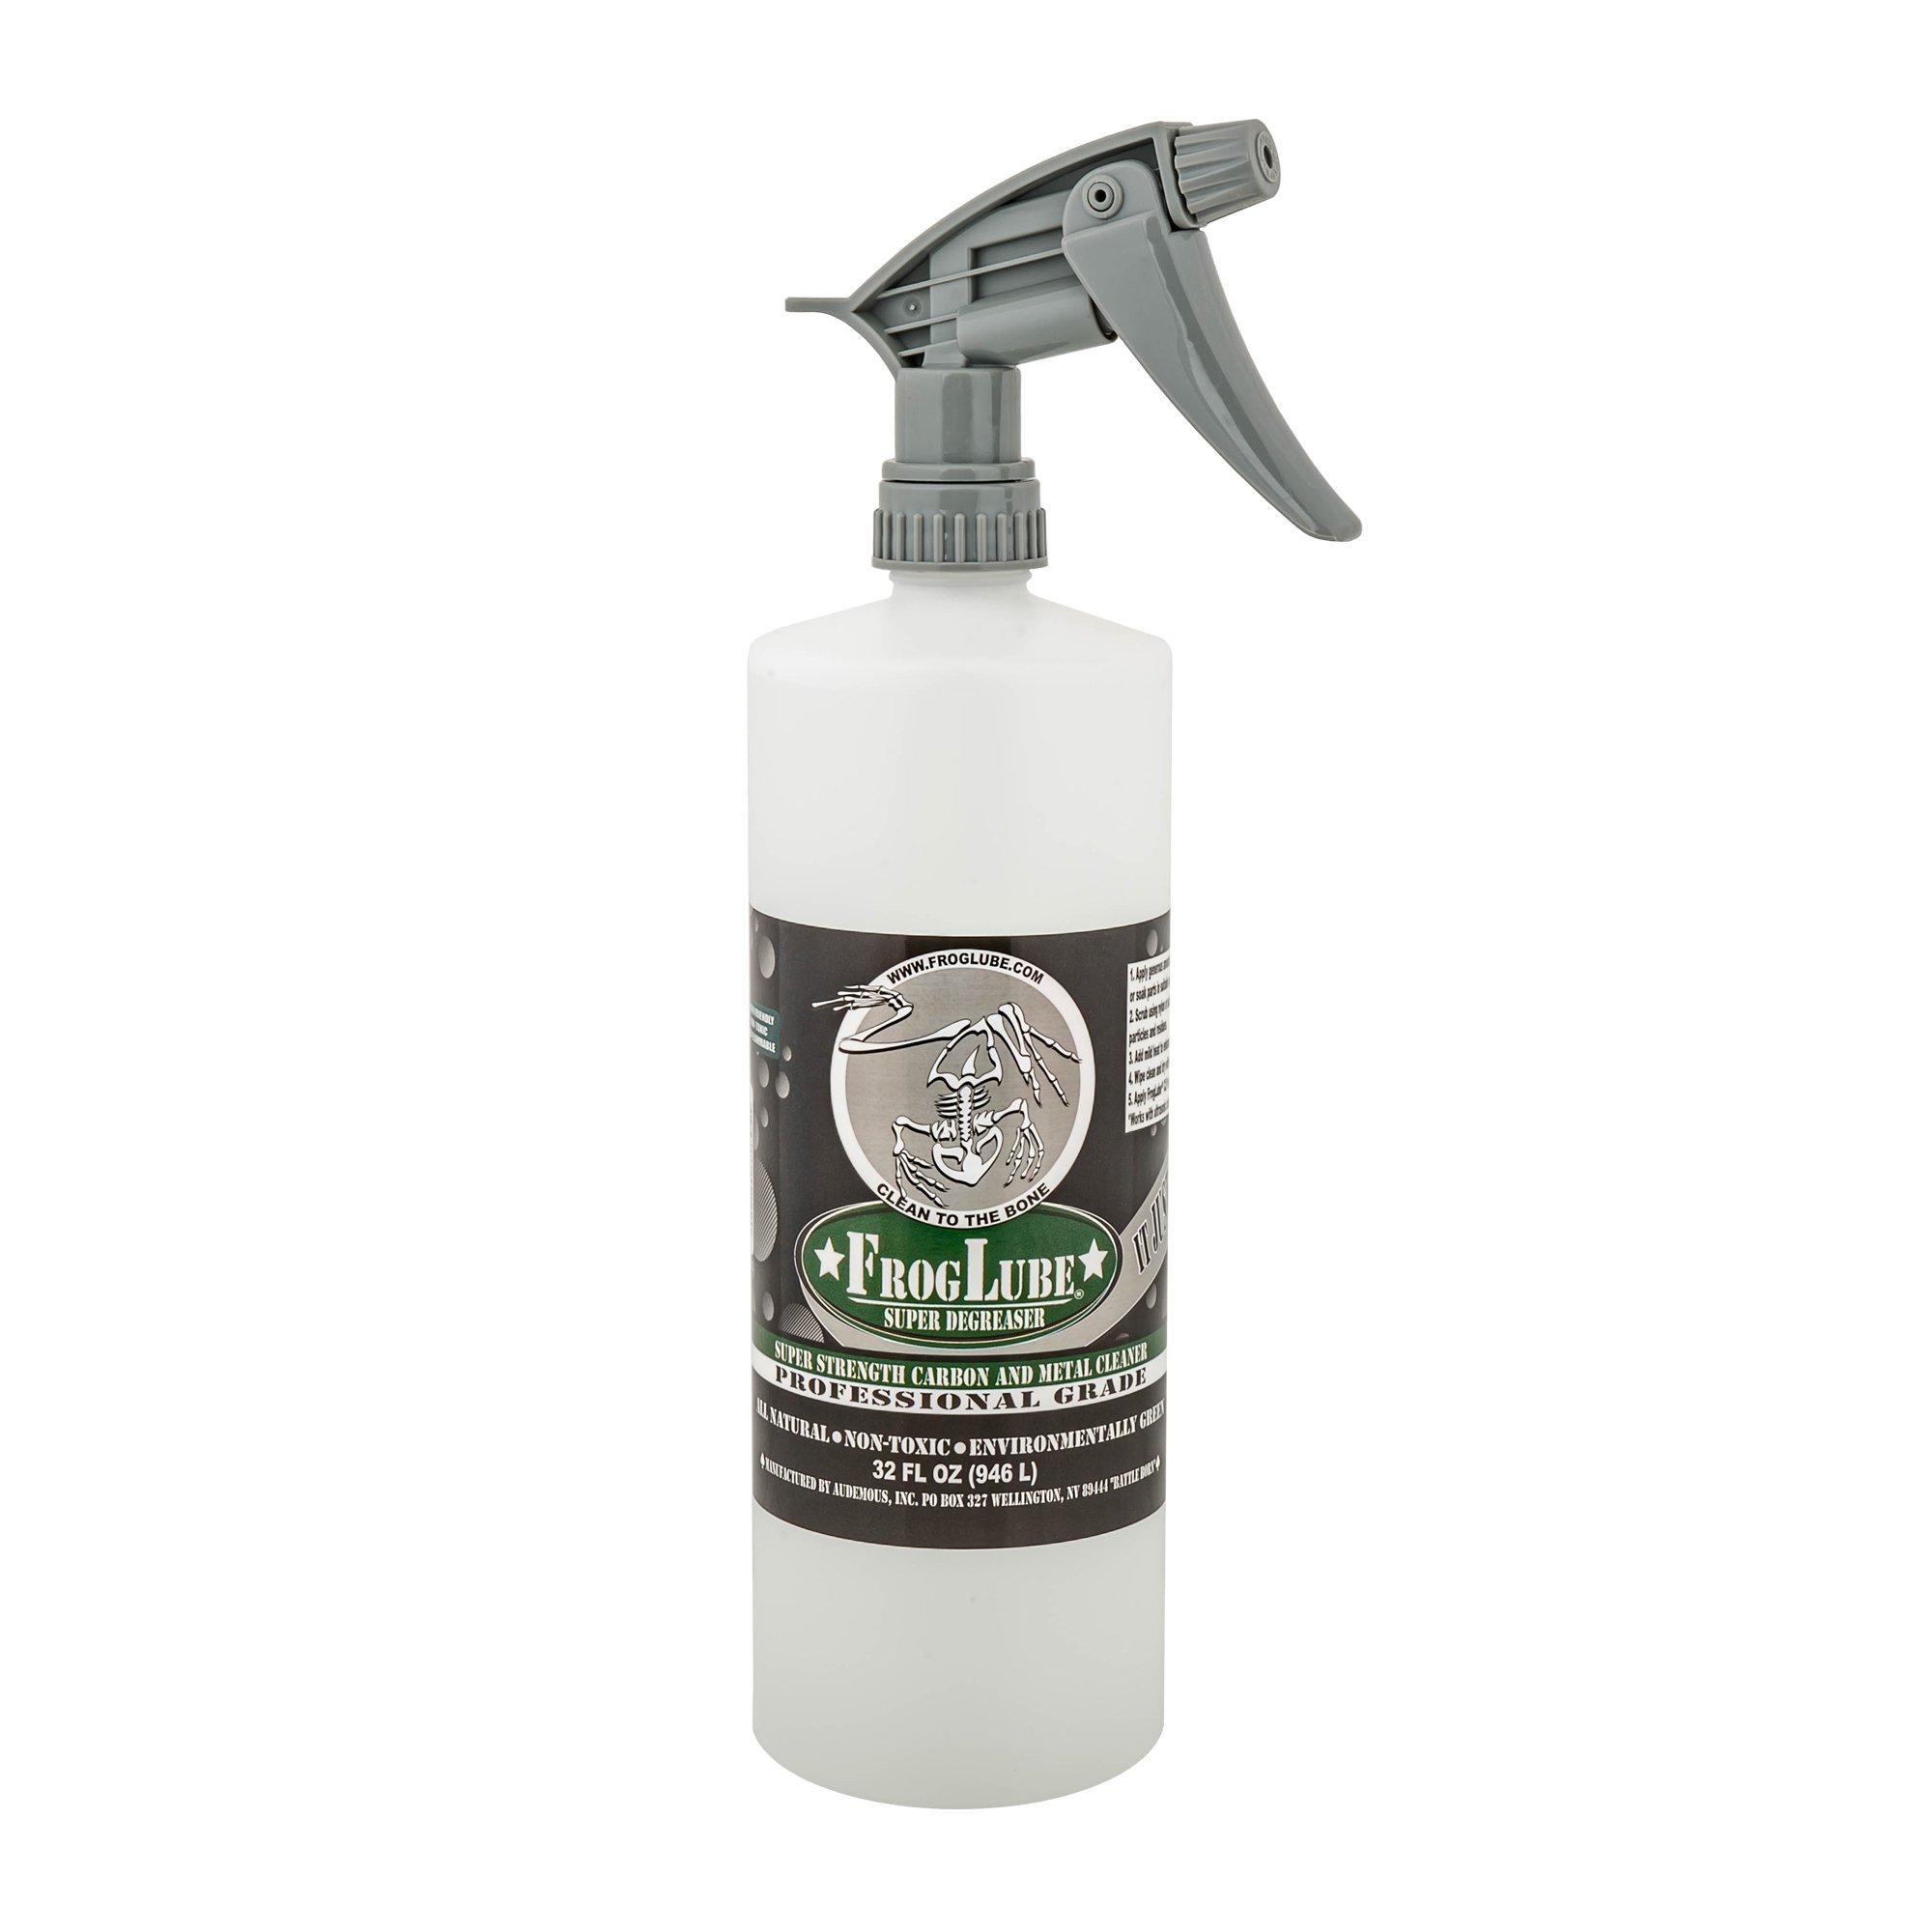 FrogLube Professional Grade Super Degreaser, 32 oz. Pump Spray